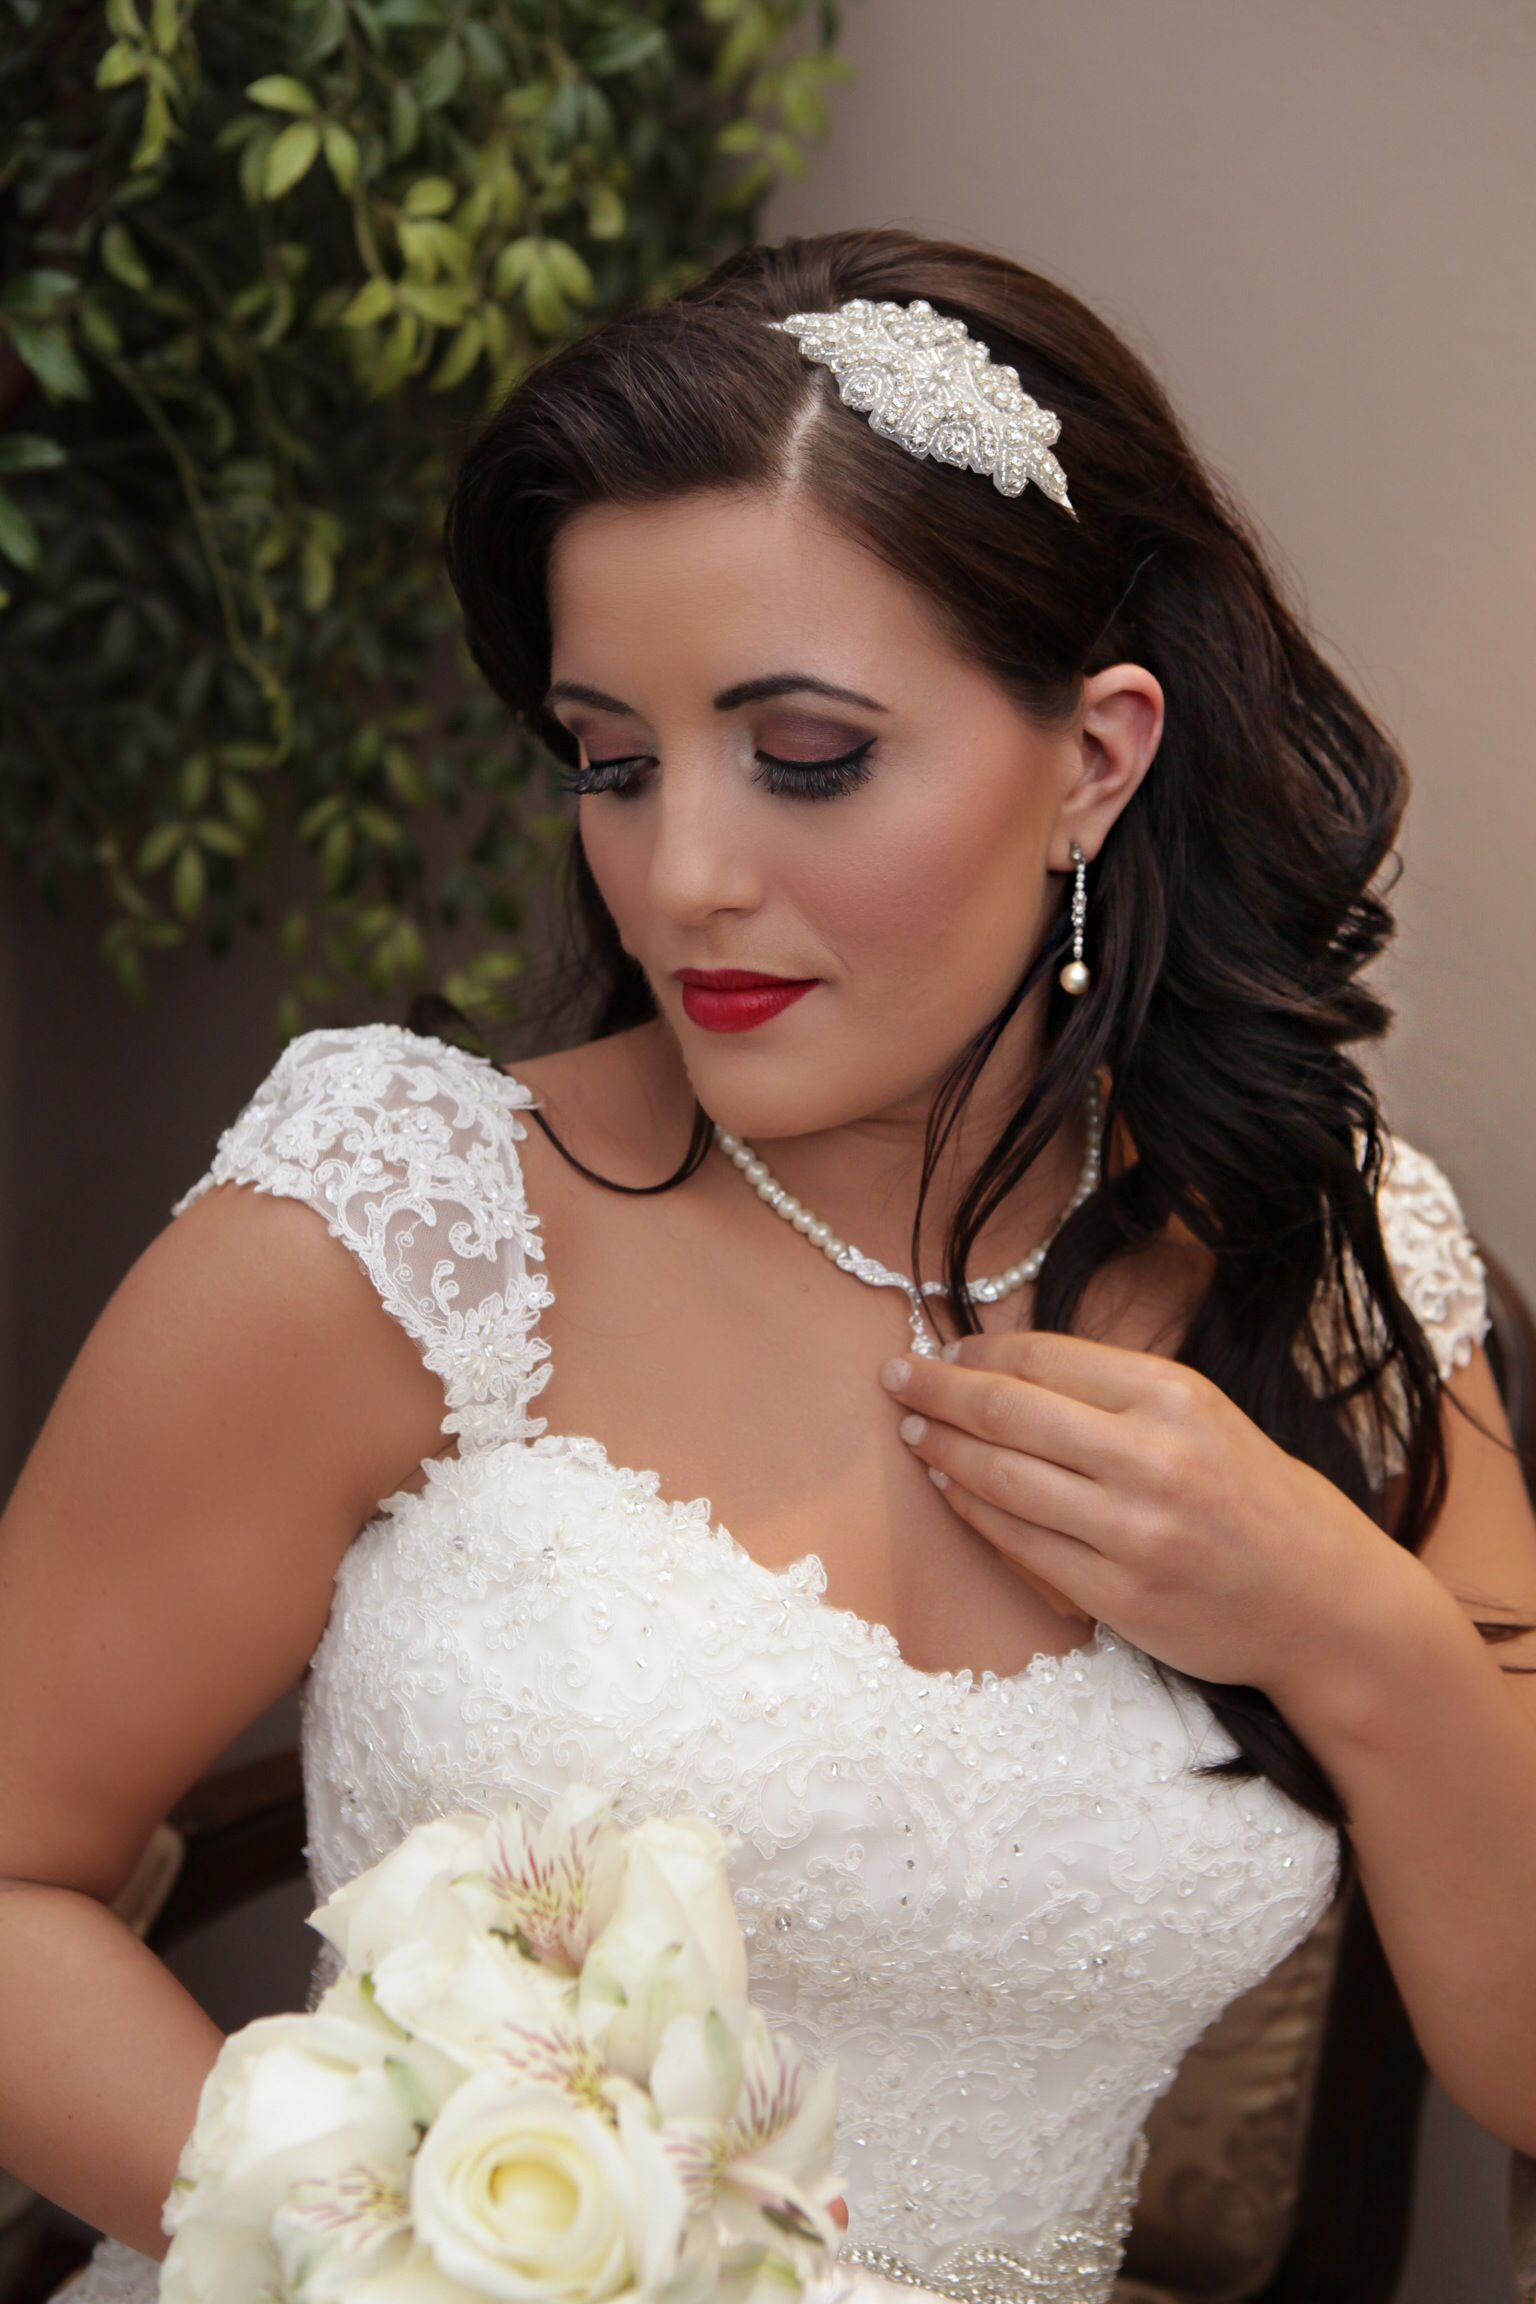 Vintage styled wedding hair and makeup Las vegas wedding